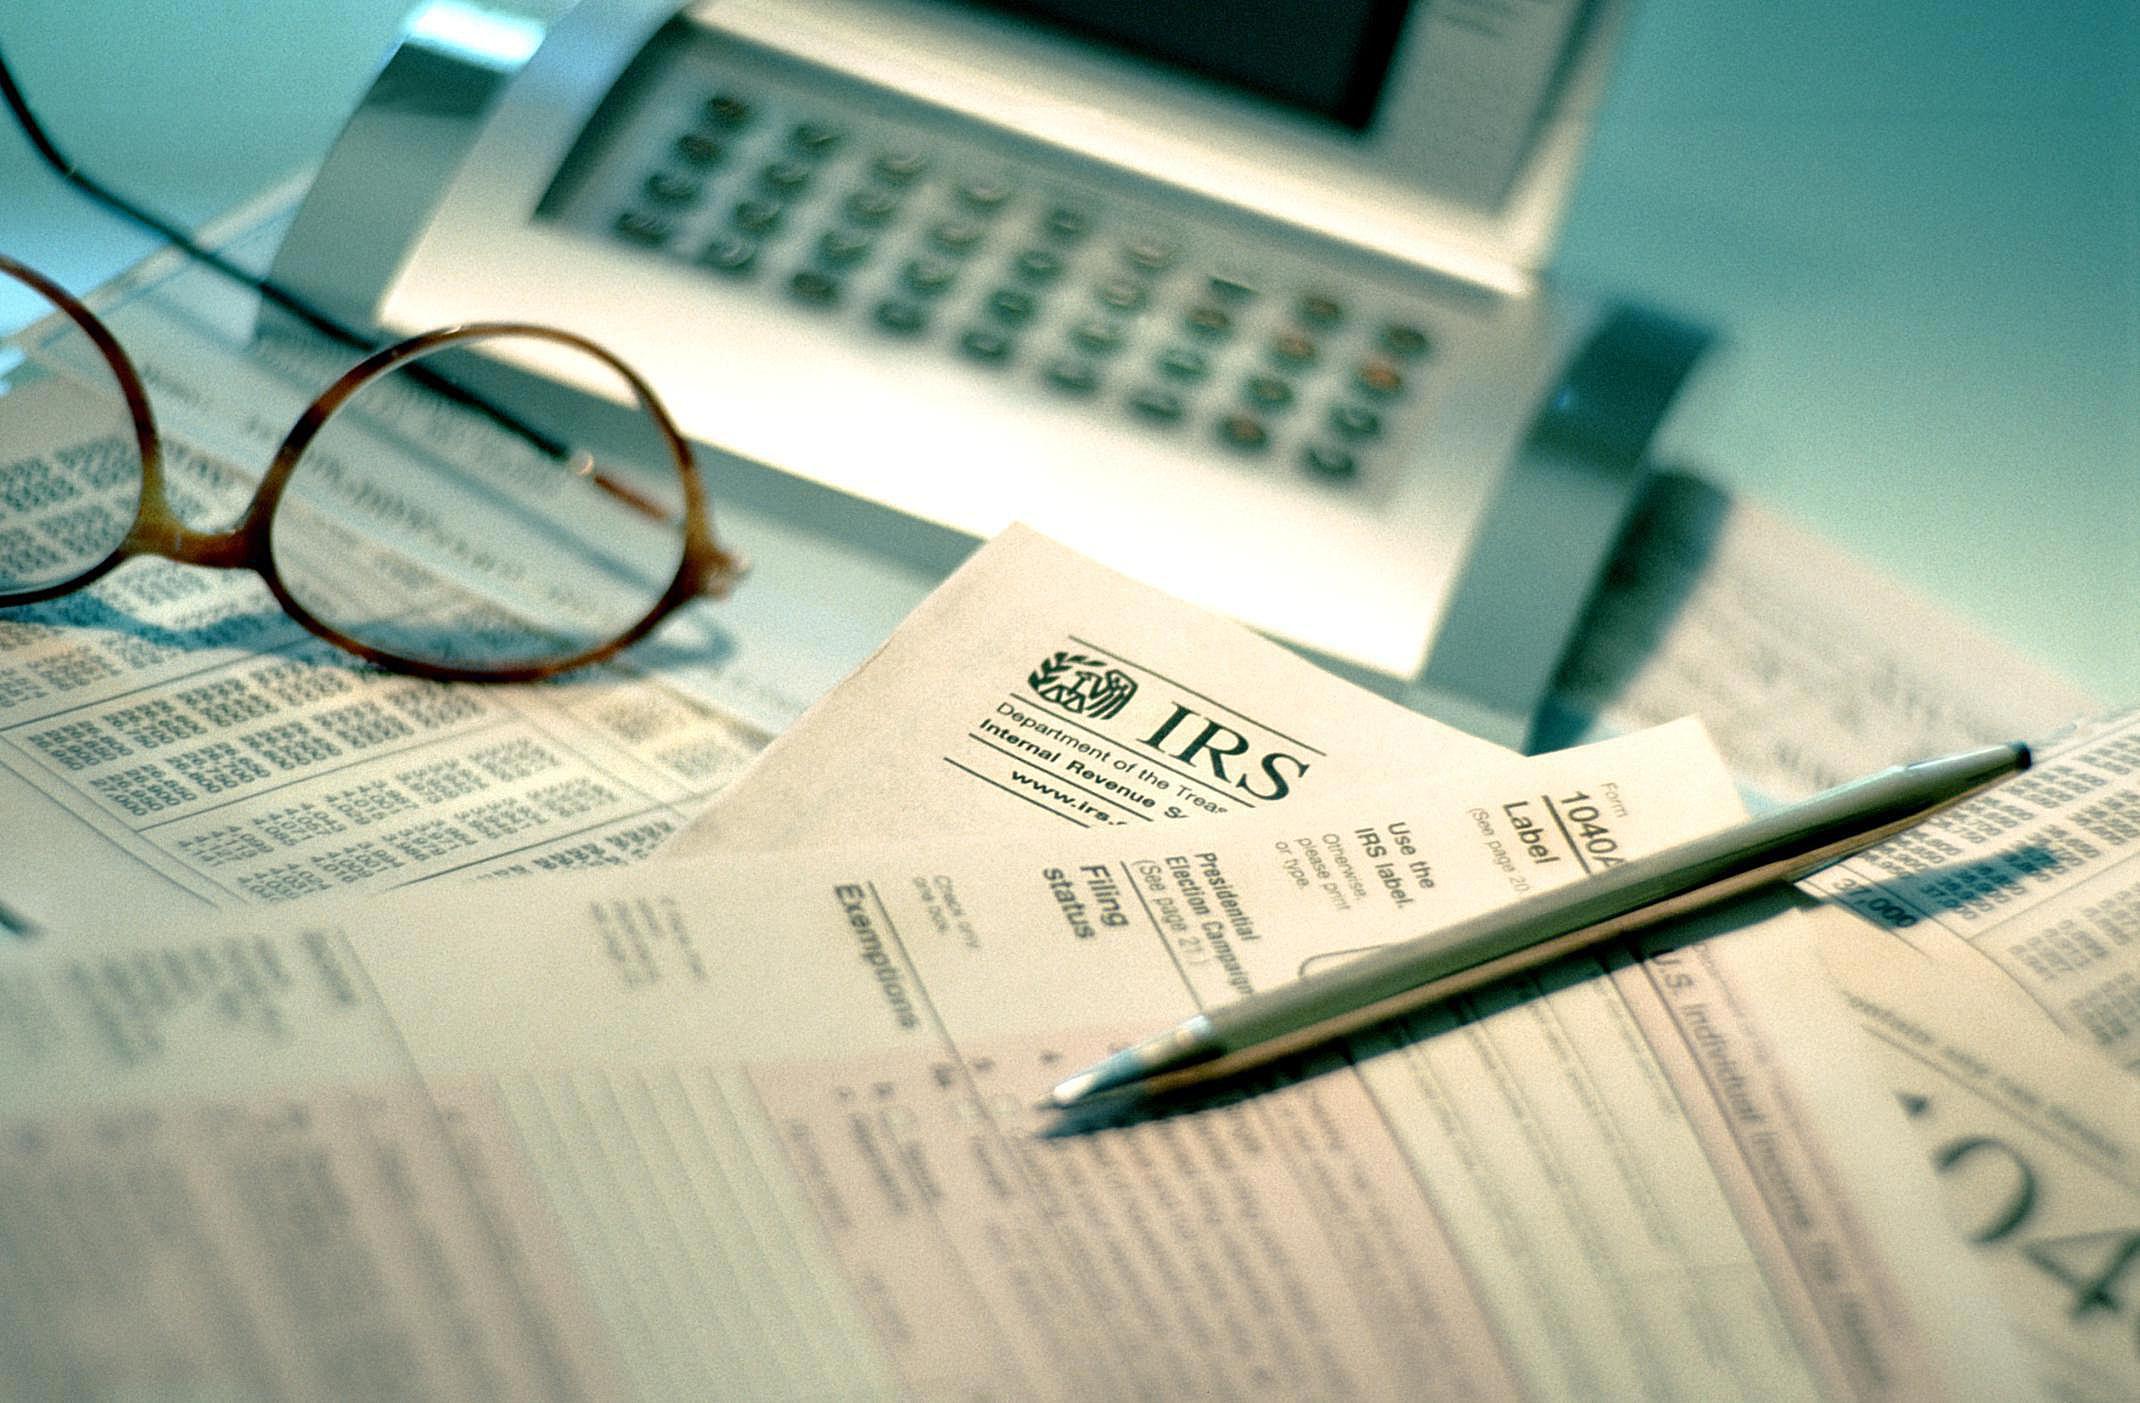 Filing An Amended Tax Return Using Irs Form X